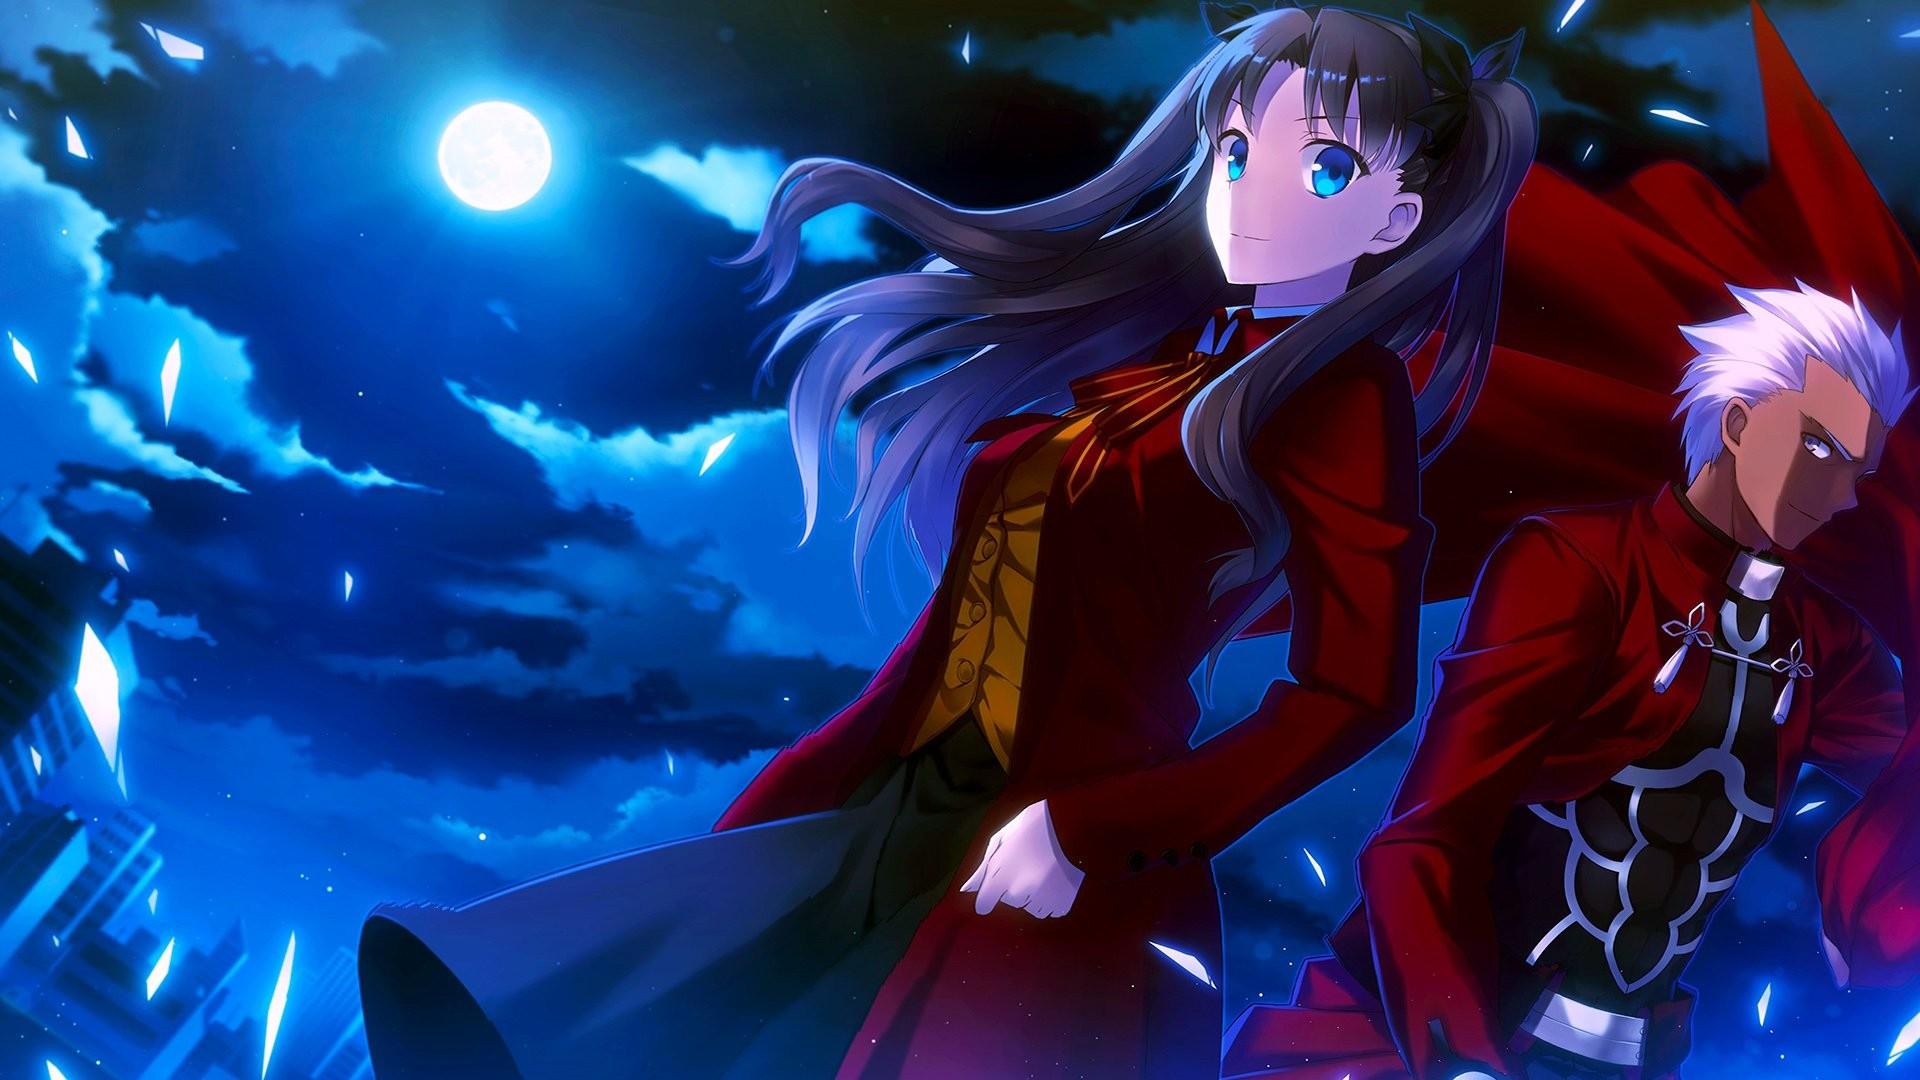 Anime – Fate/Stay Night Archer (Fate/Stay Night) Rin Tohsaka Bakgrund